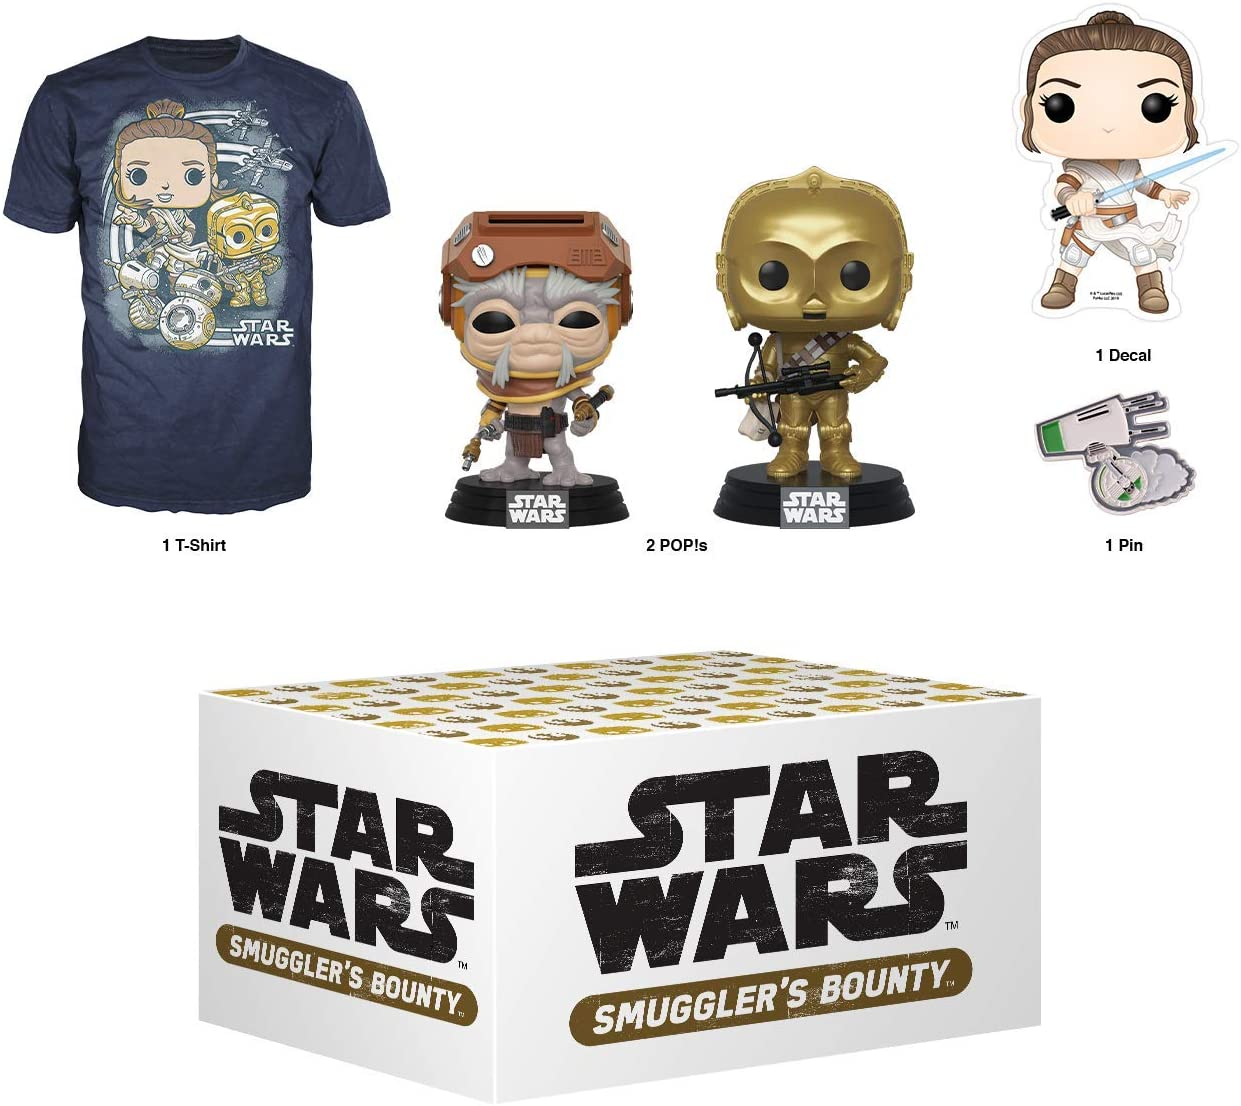 "Smuggler/'s Bounty exclusive 2XL T-SHIRT Funko /""Star Wars/"" Darth Vader"